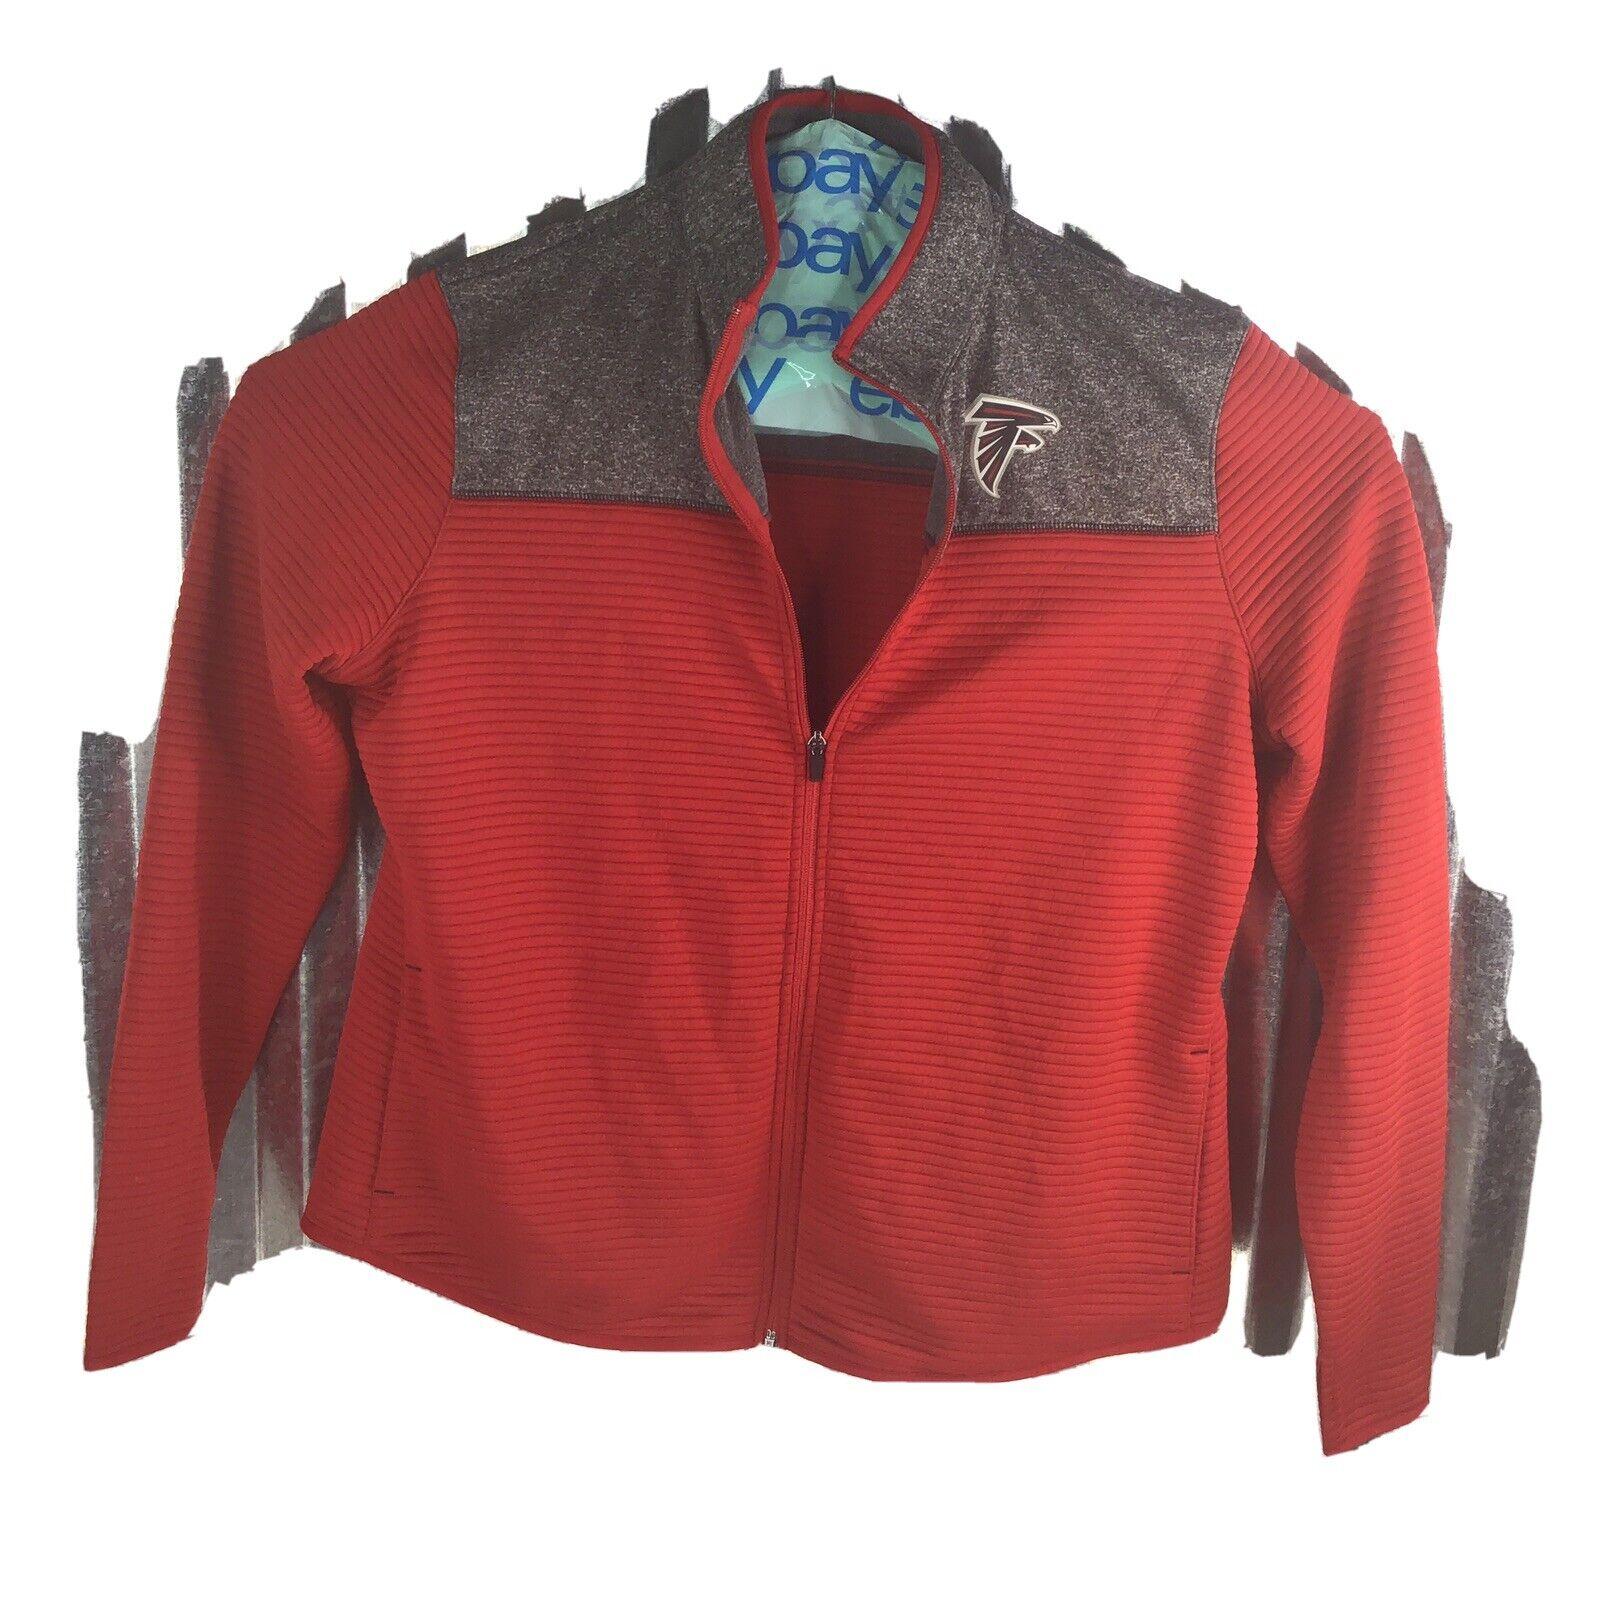 Team Apparel NFL TX3 Warm Up Jacket Atlanta Falcons Red Grey Women's Size XXL